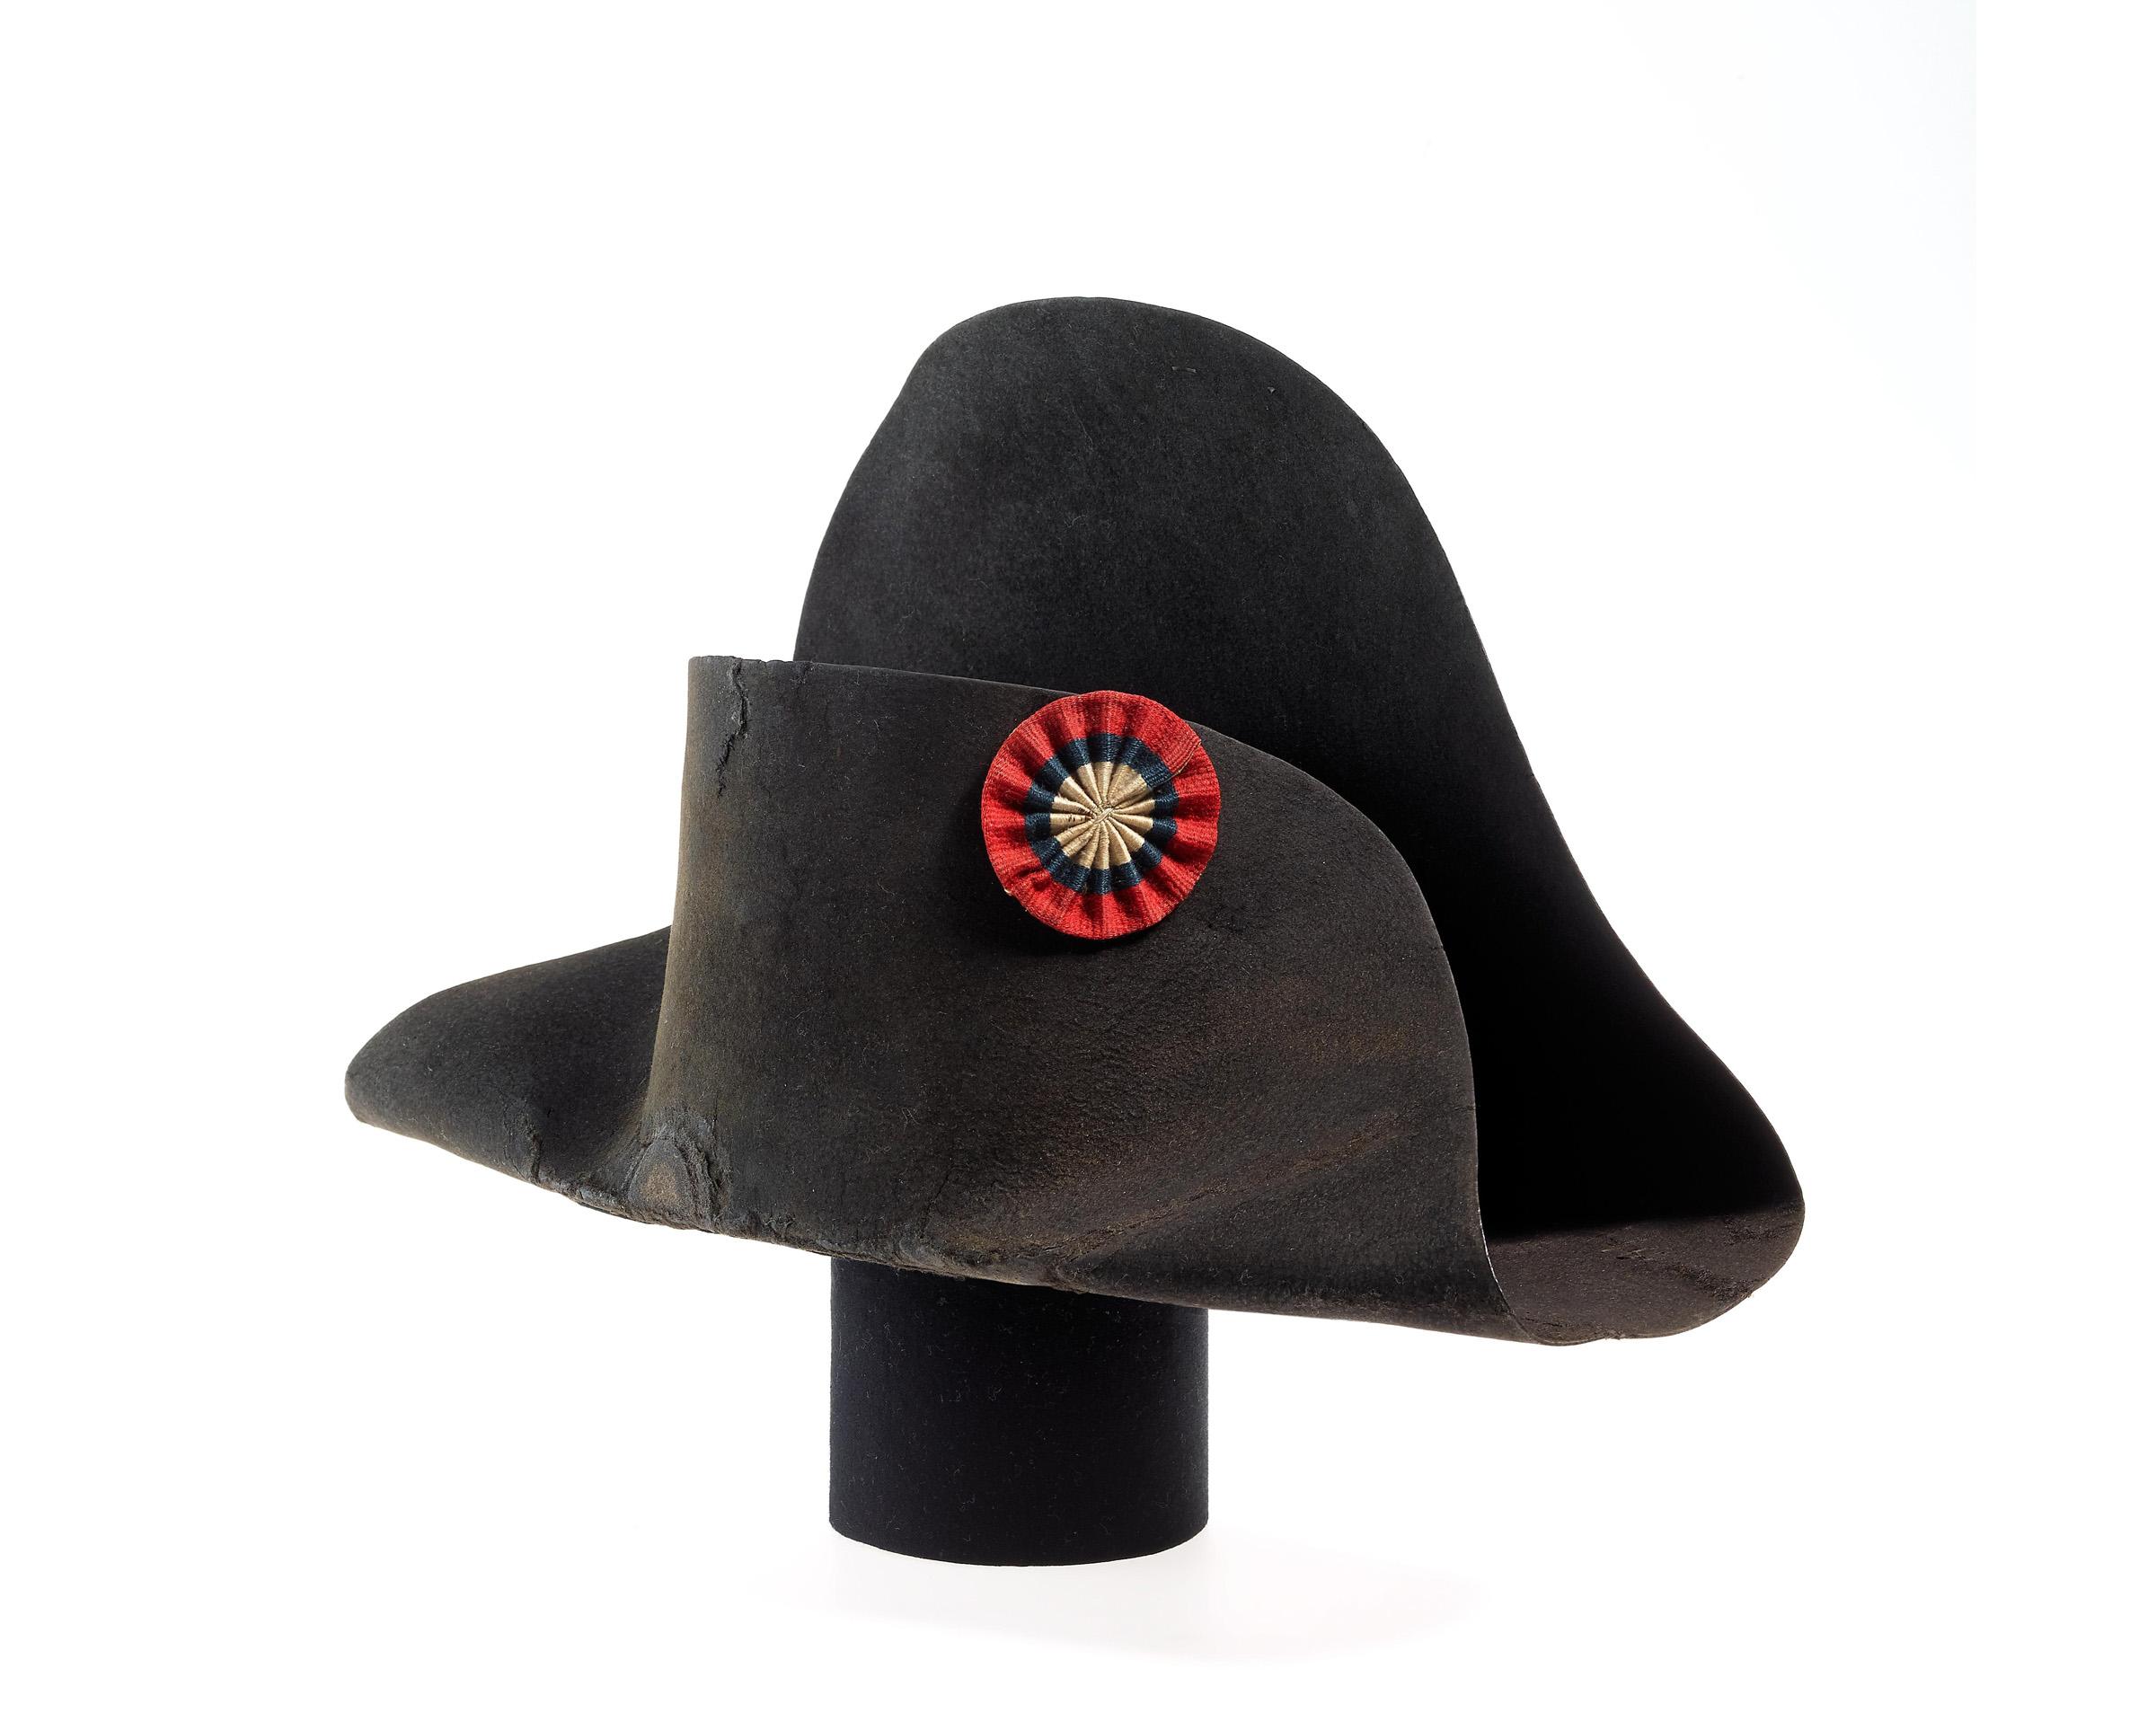 46c171163f0 Napoleon s Hat - Age of Revolution